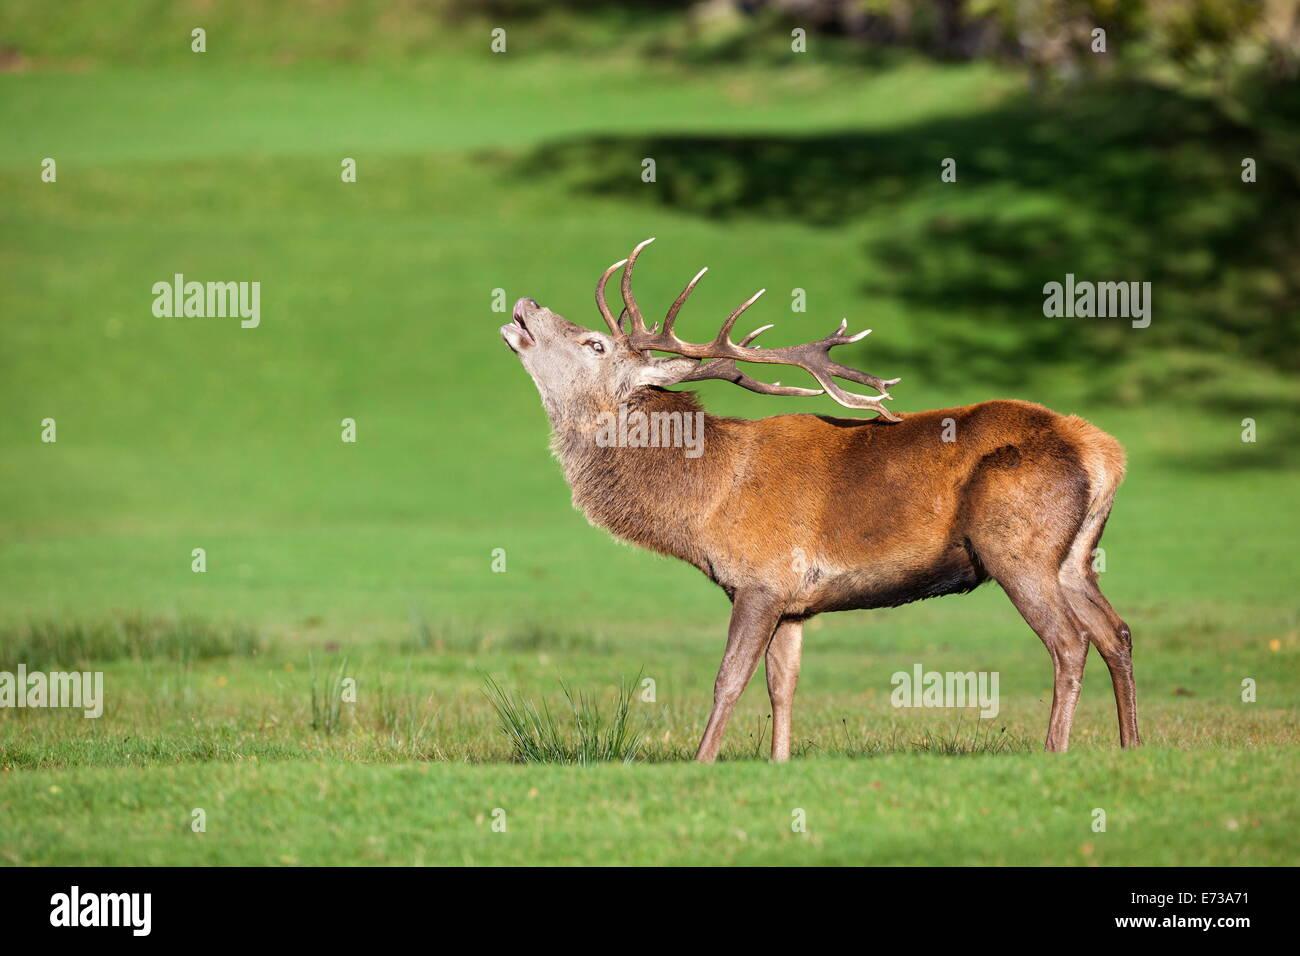 Red deer stag (Cervus elaphus) roaring, Arran, Scotland, United Kingdom, Europe - Stock Image